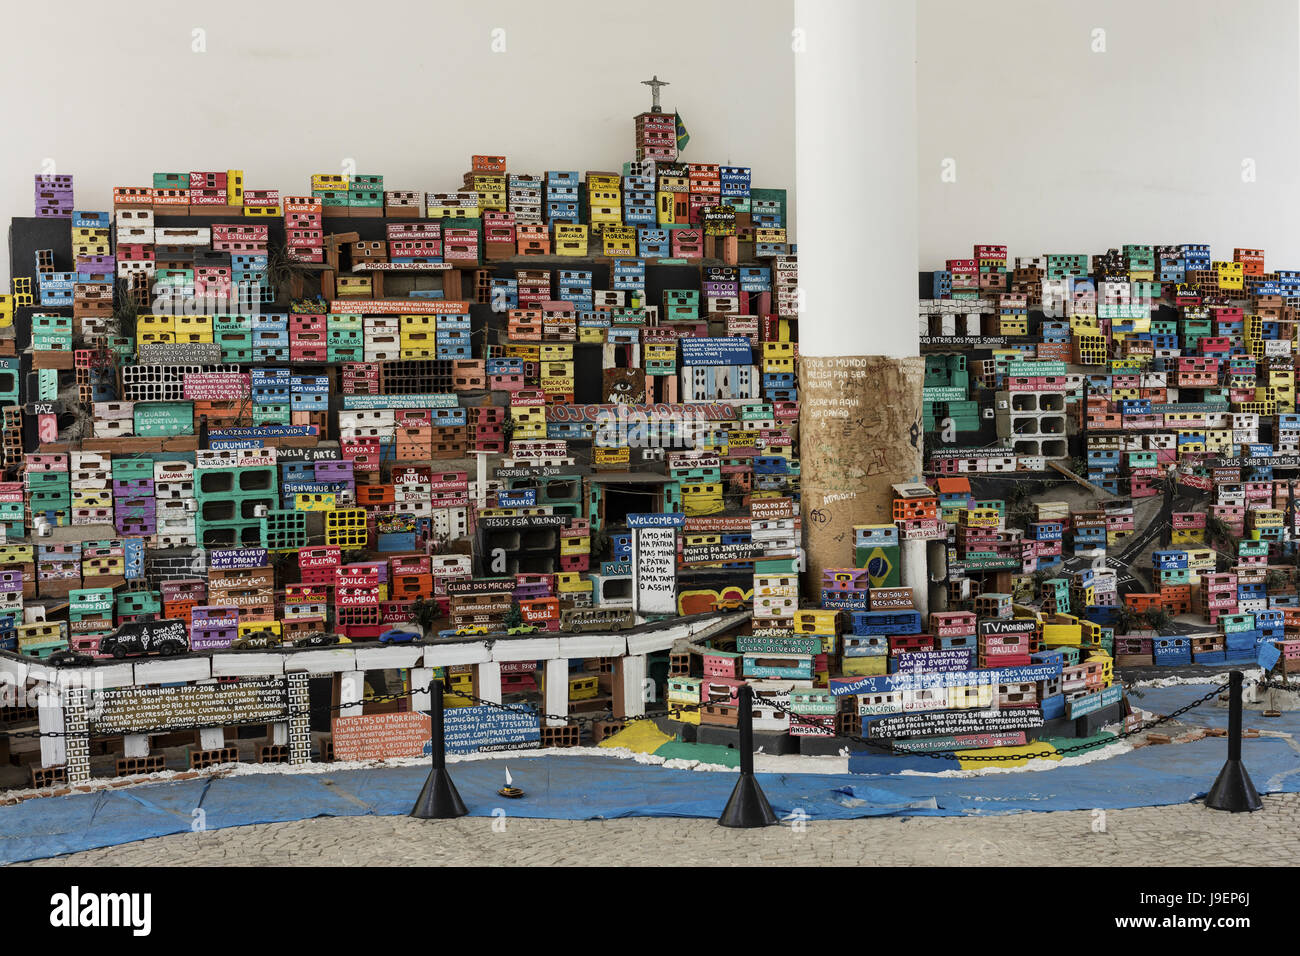 Gallery in Rio Art Museum (MAR; Museu de Arte do Rio) - Stock Image